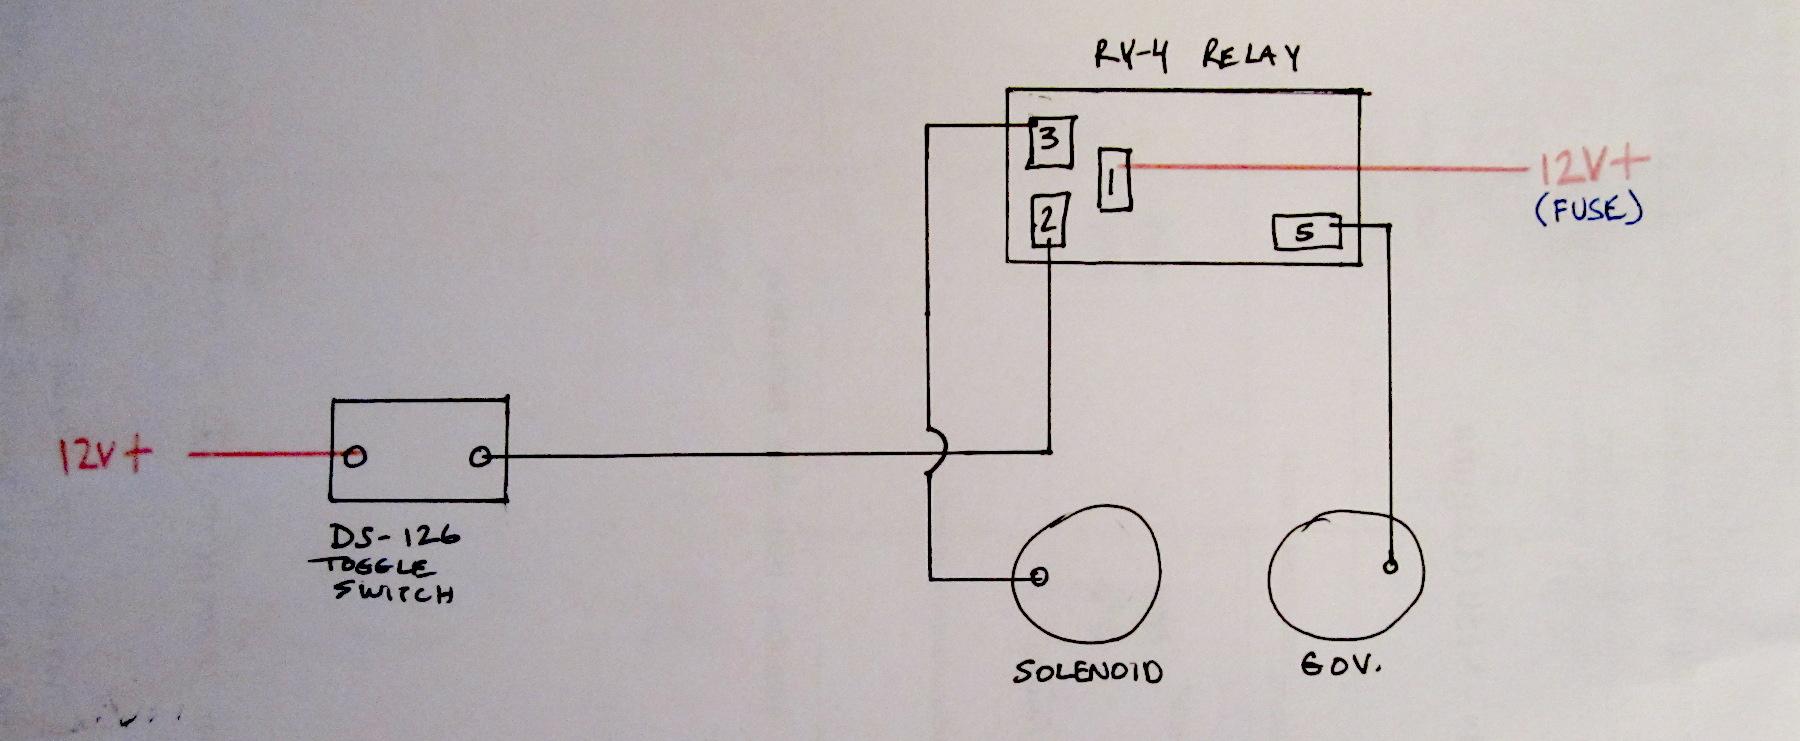 hight resolution of r 10 borg warner wiring help page 2 the h a m b borg warner overdrive borg warner overdrive wiring diagram